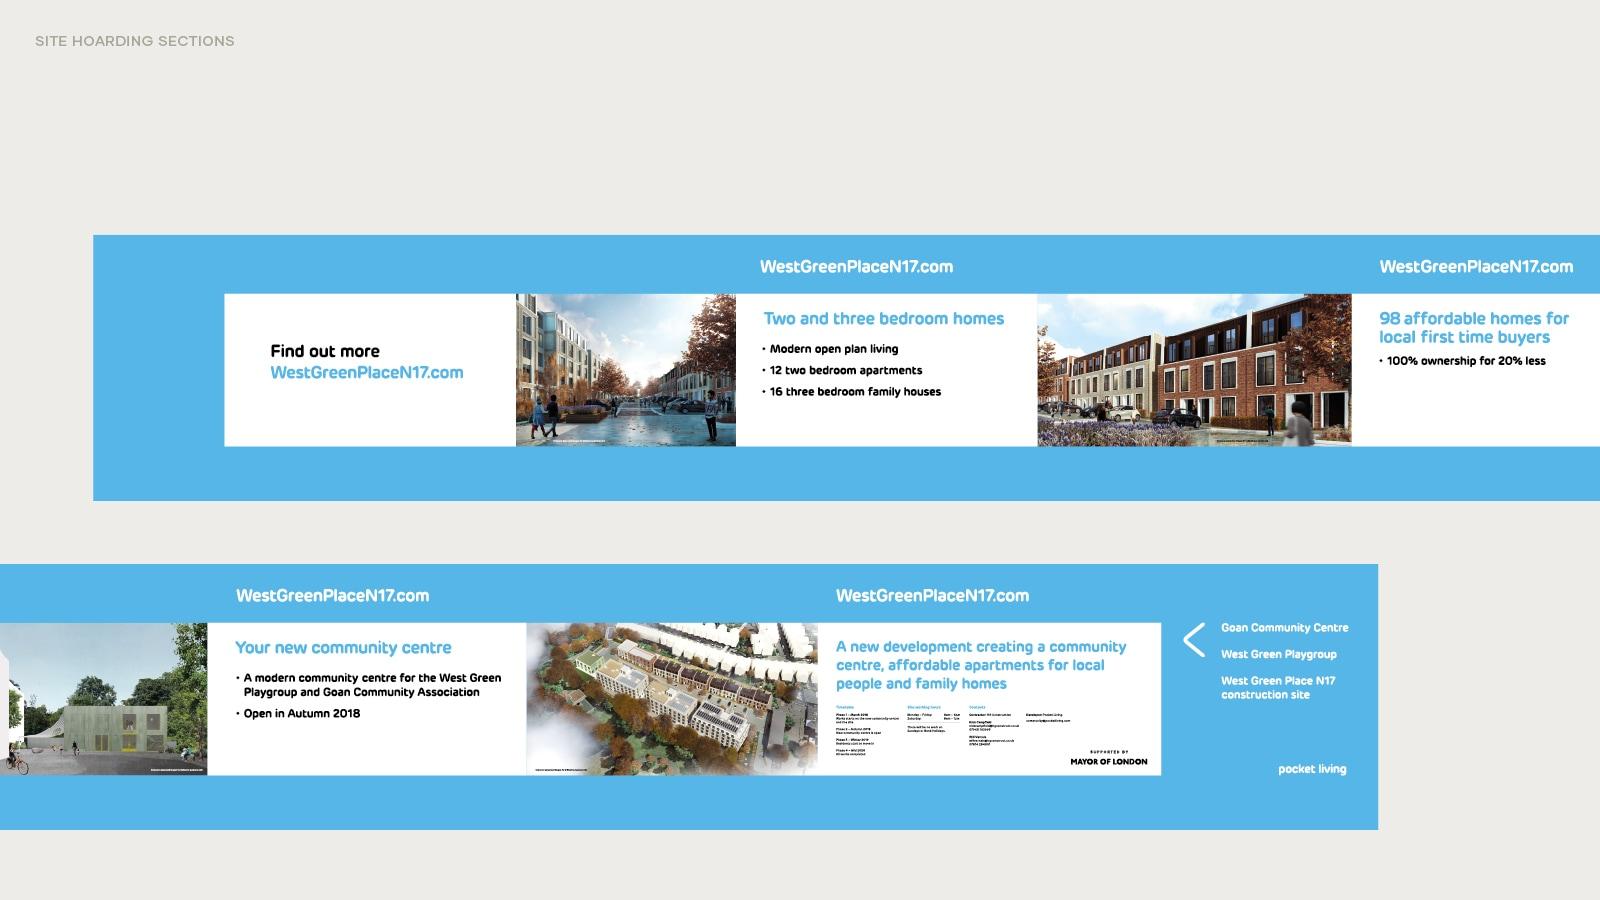 property-marketing-business-communications-branding-graphic-design-milton-keynes-london5